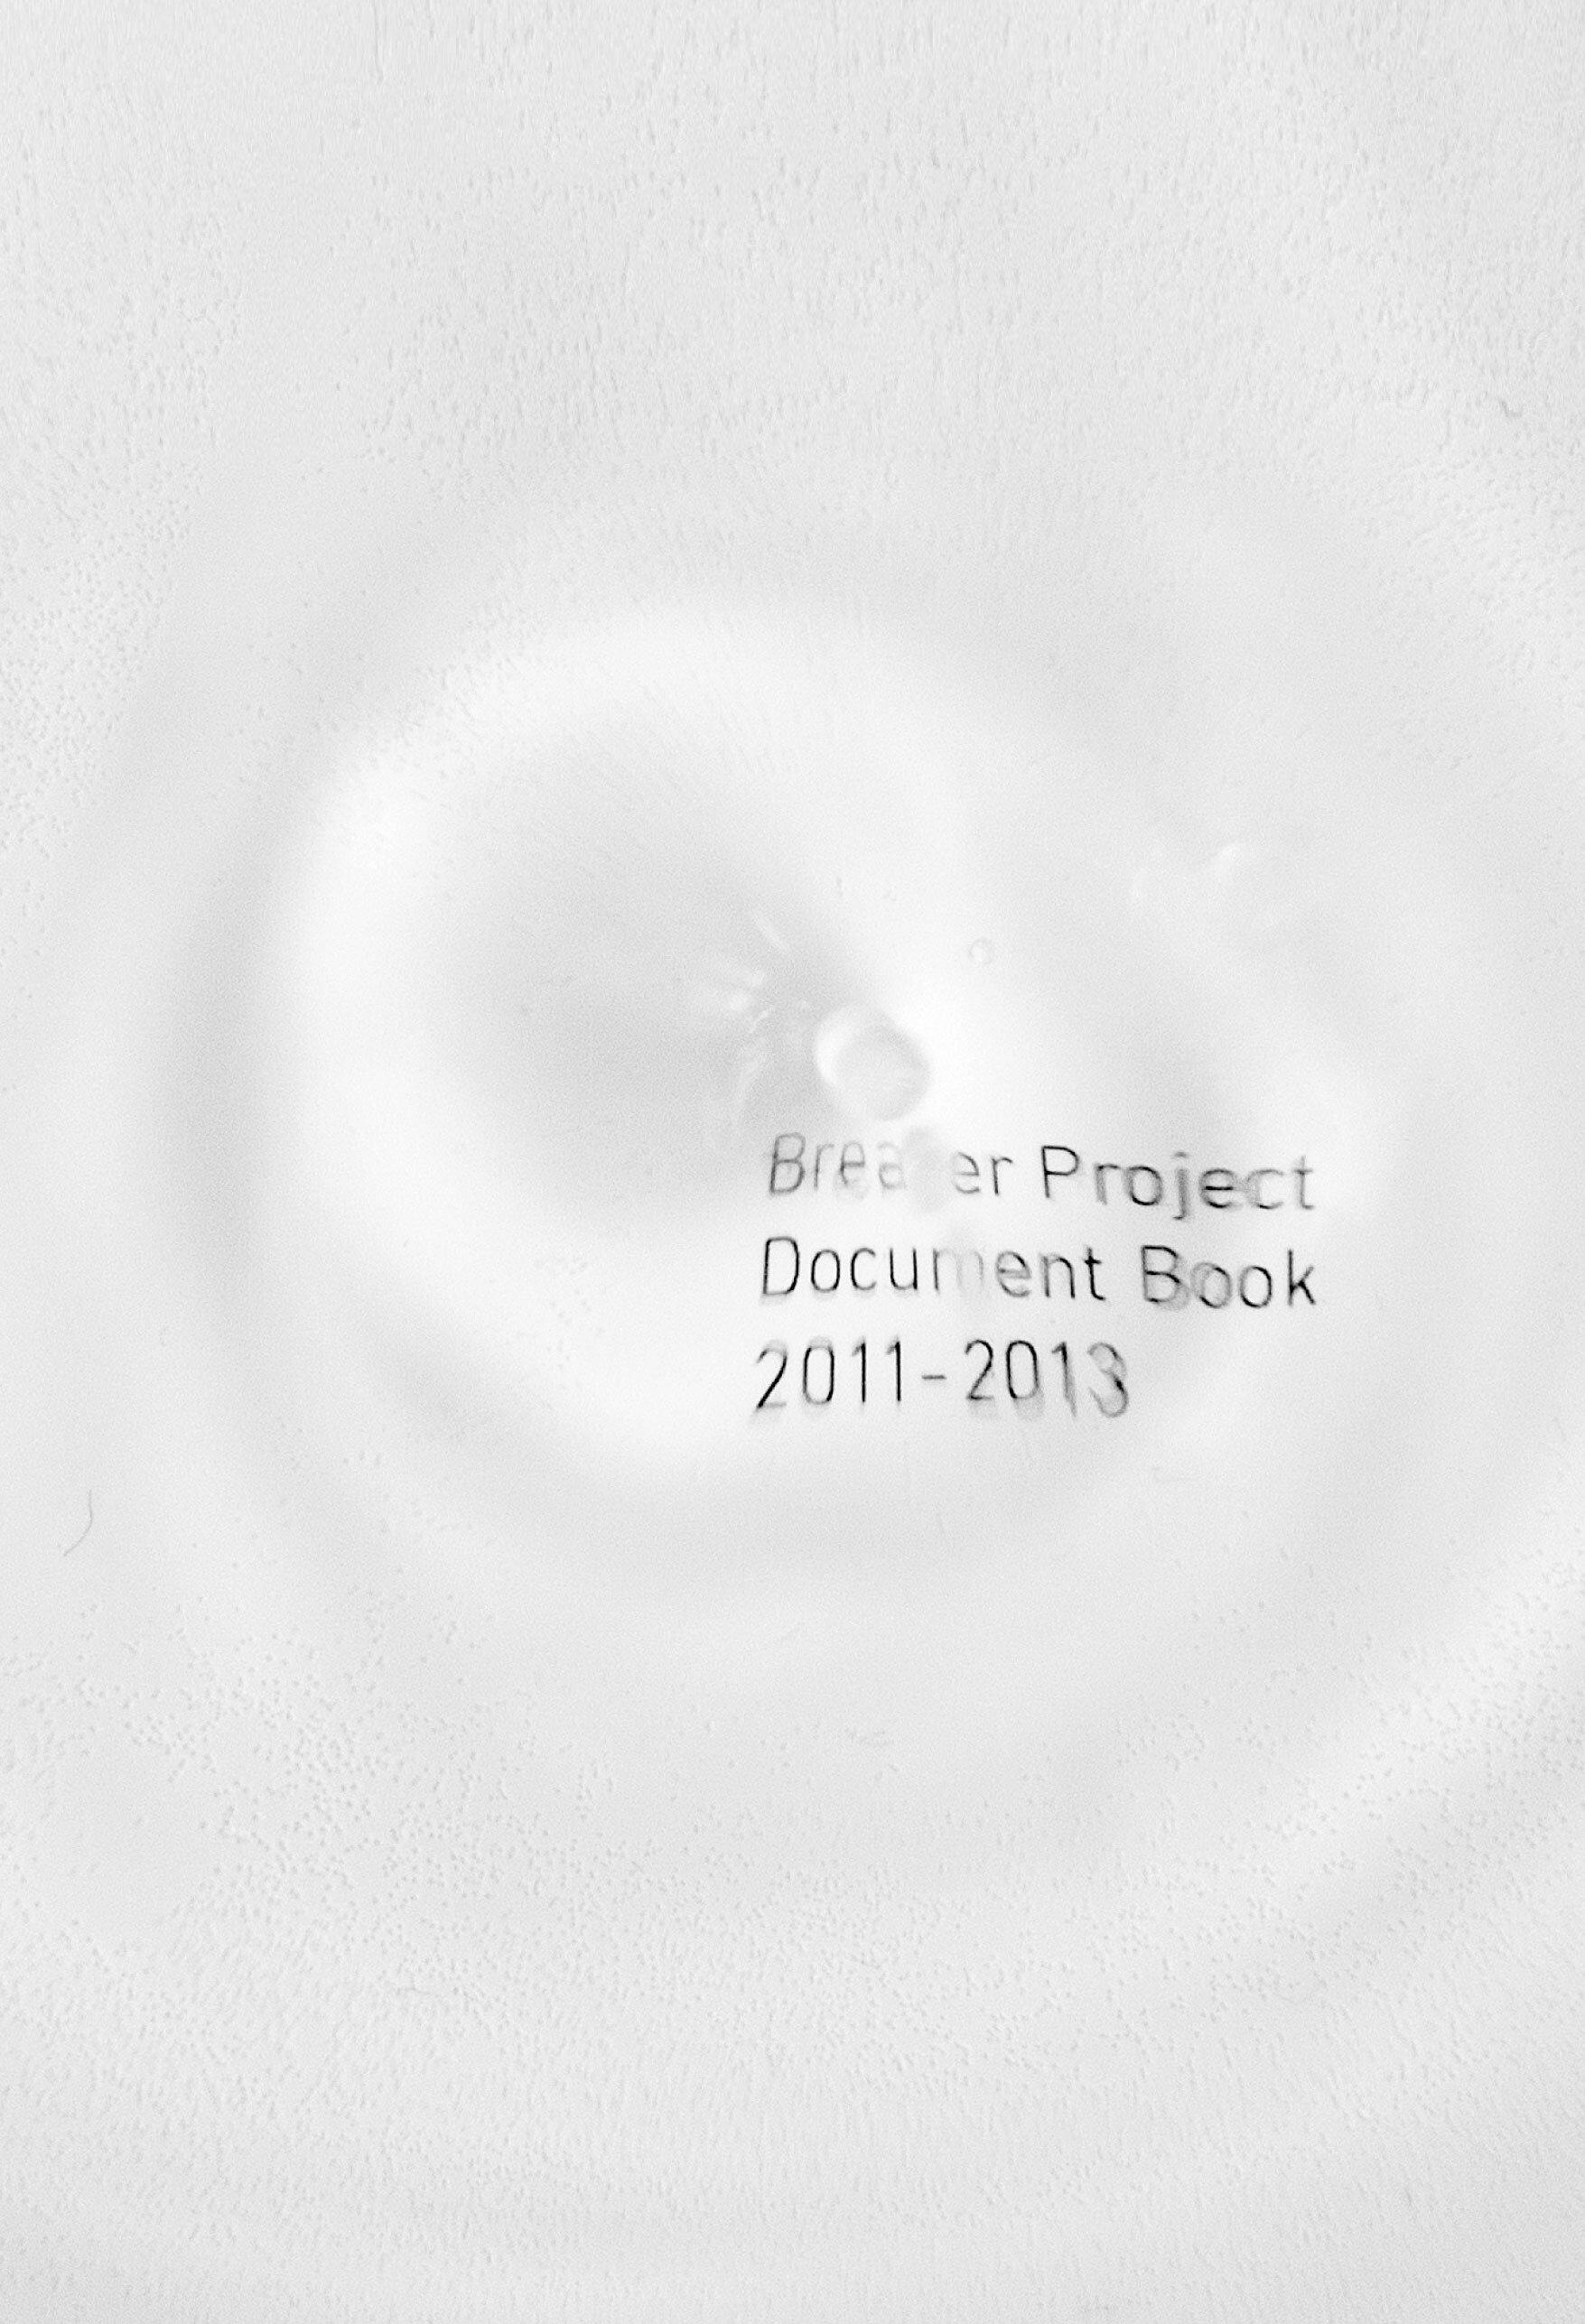 documentbook2011-2013.jpg